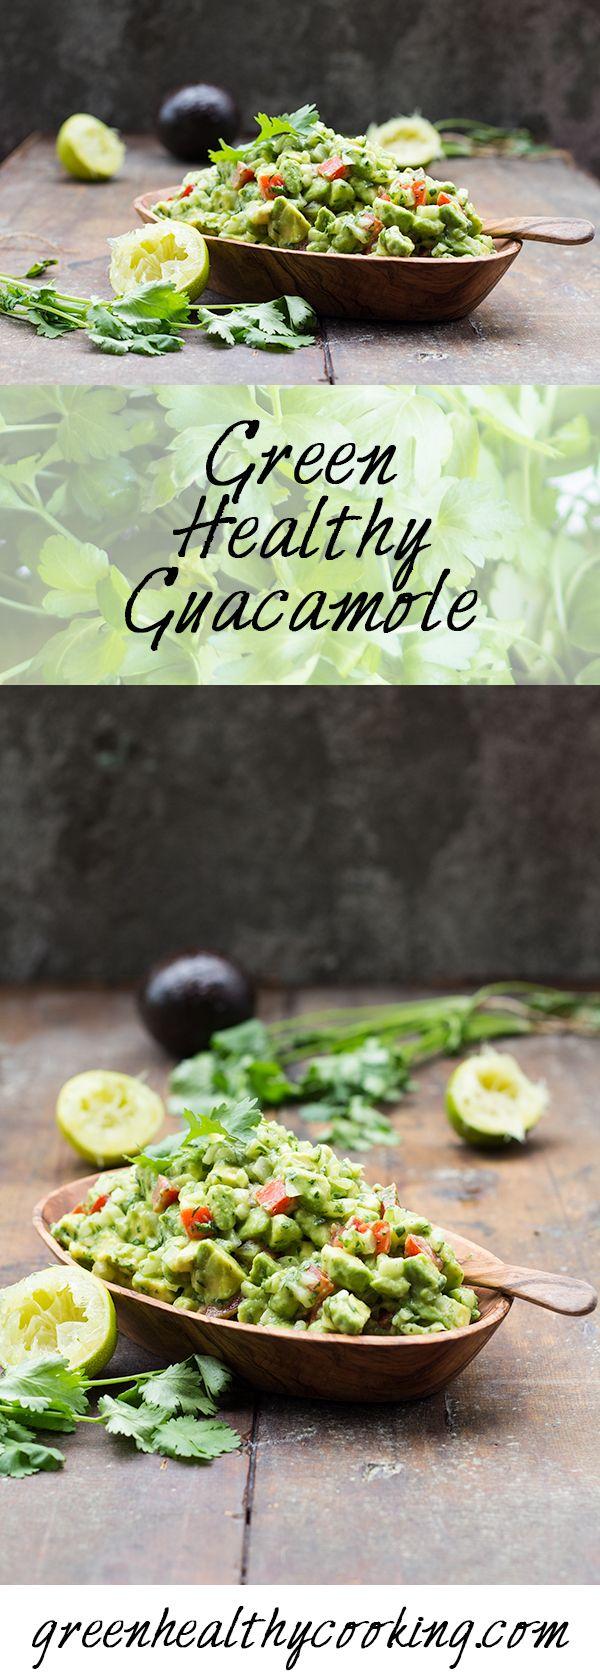 Green Healthy Guacamole Recipe Benefits of organic